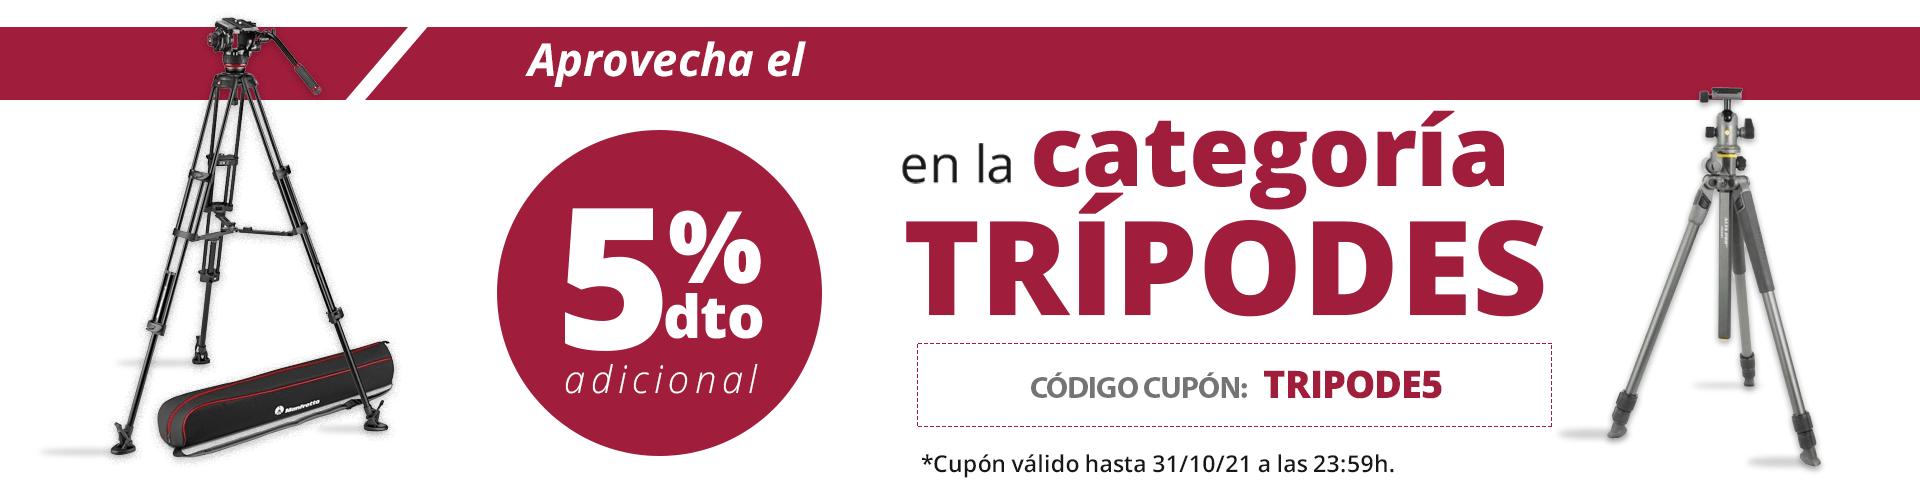 PROMO 5% DESCUENTO ADICIONAL TRIPODES